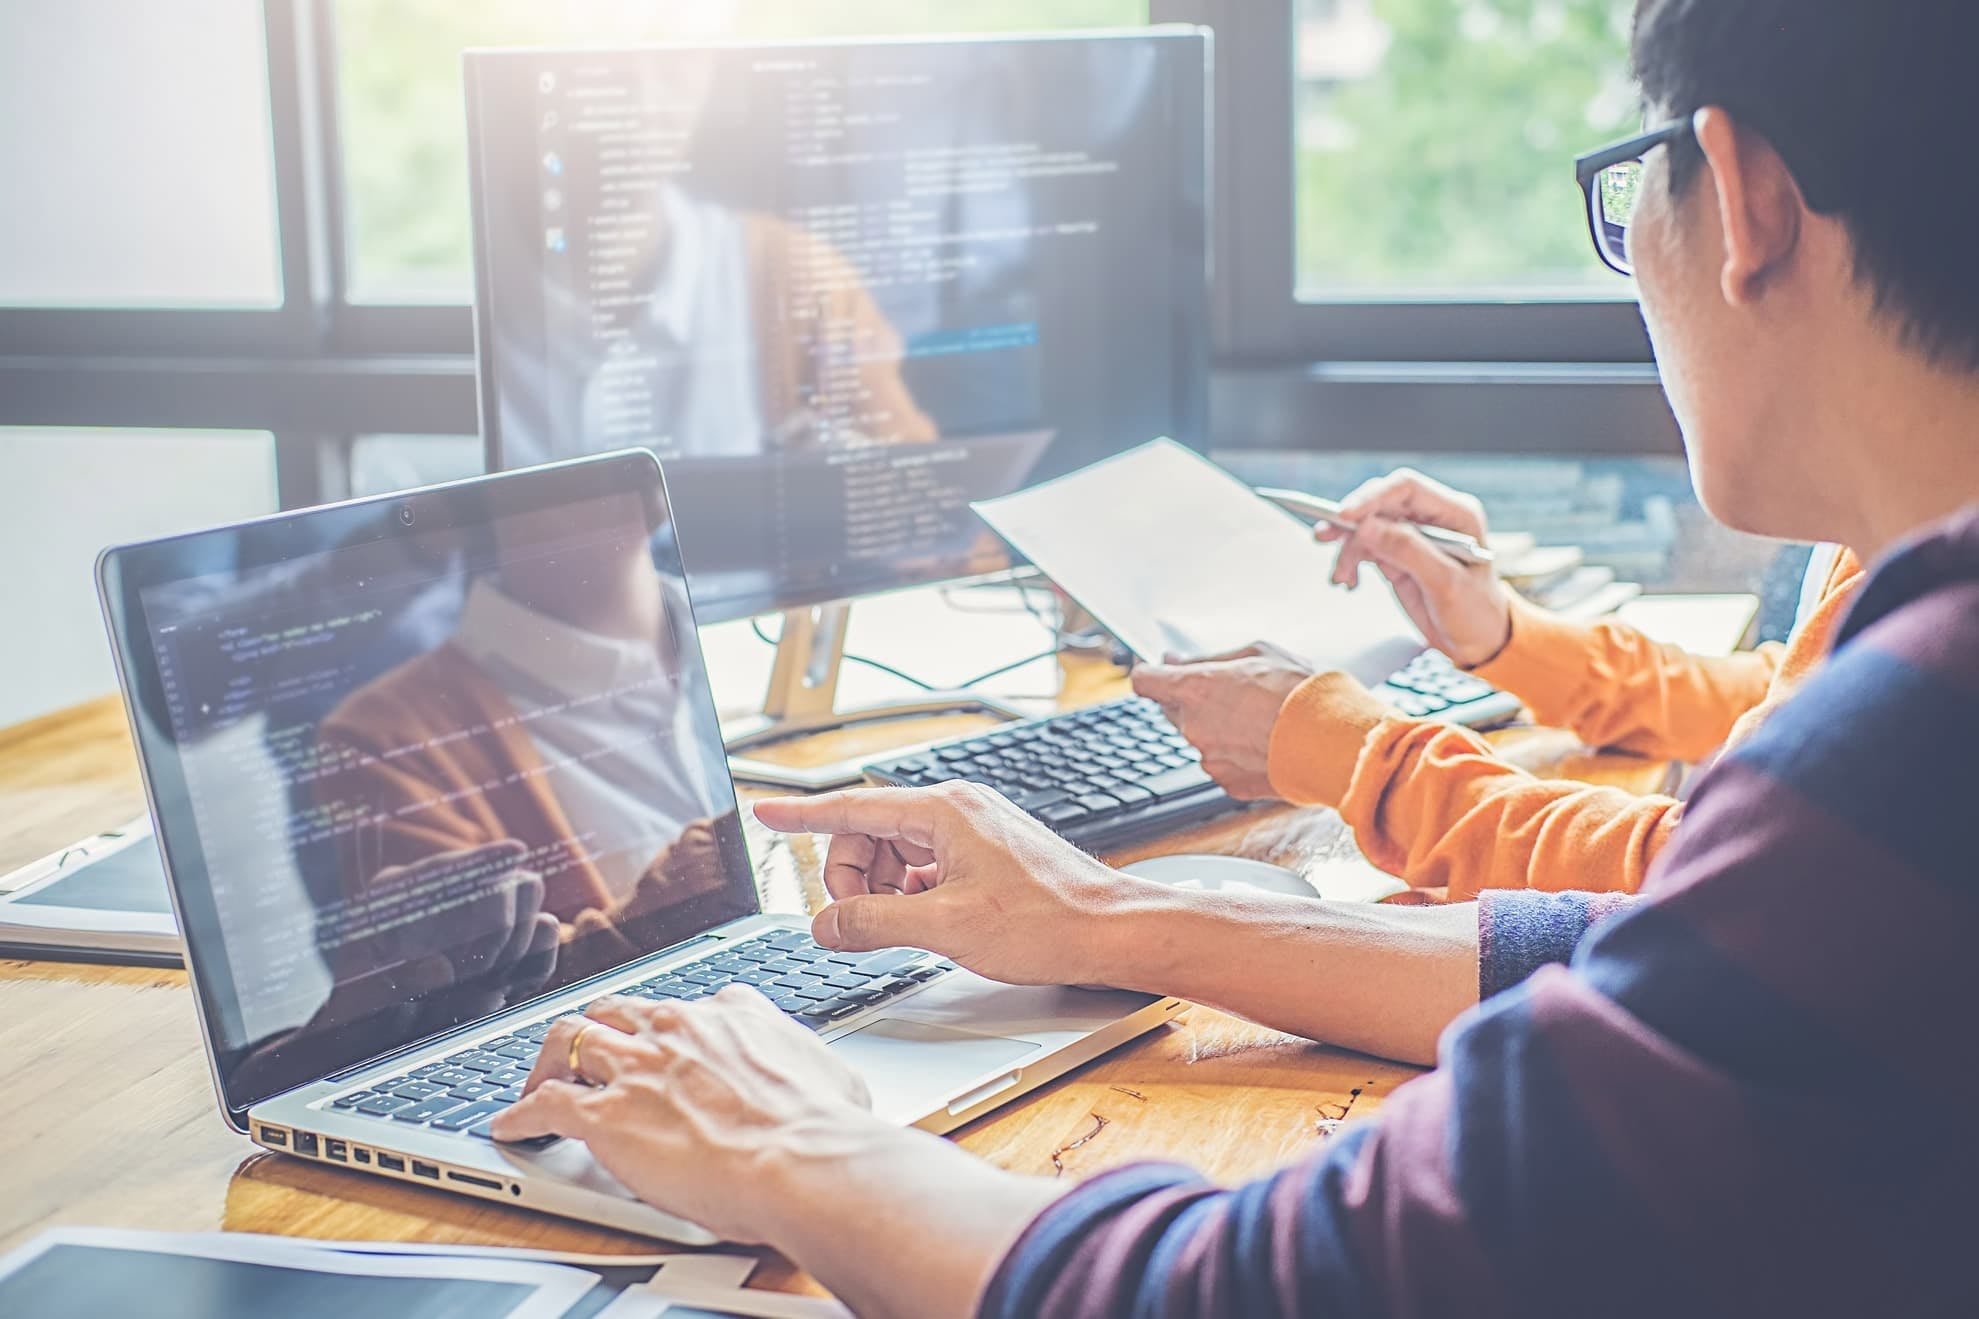 Small businesses use DigitalOcean